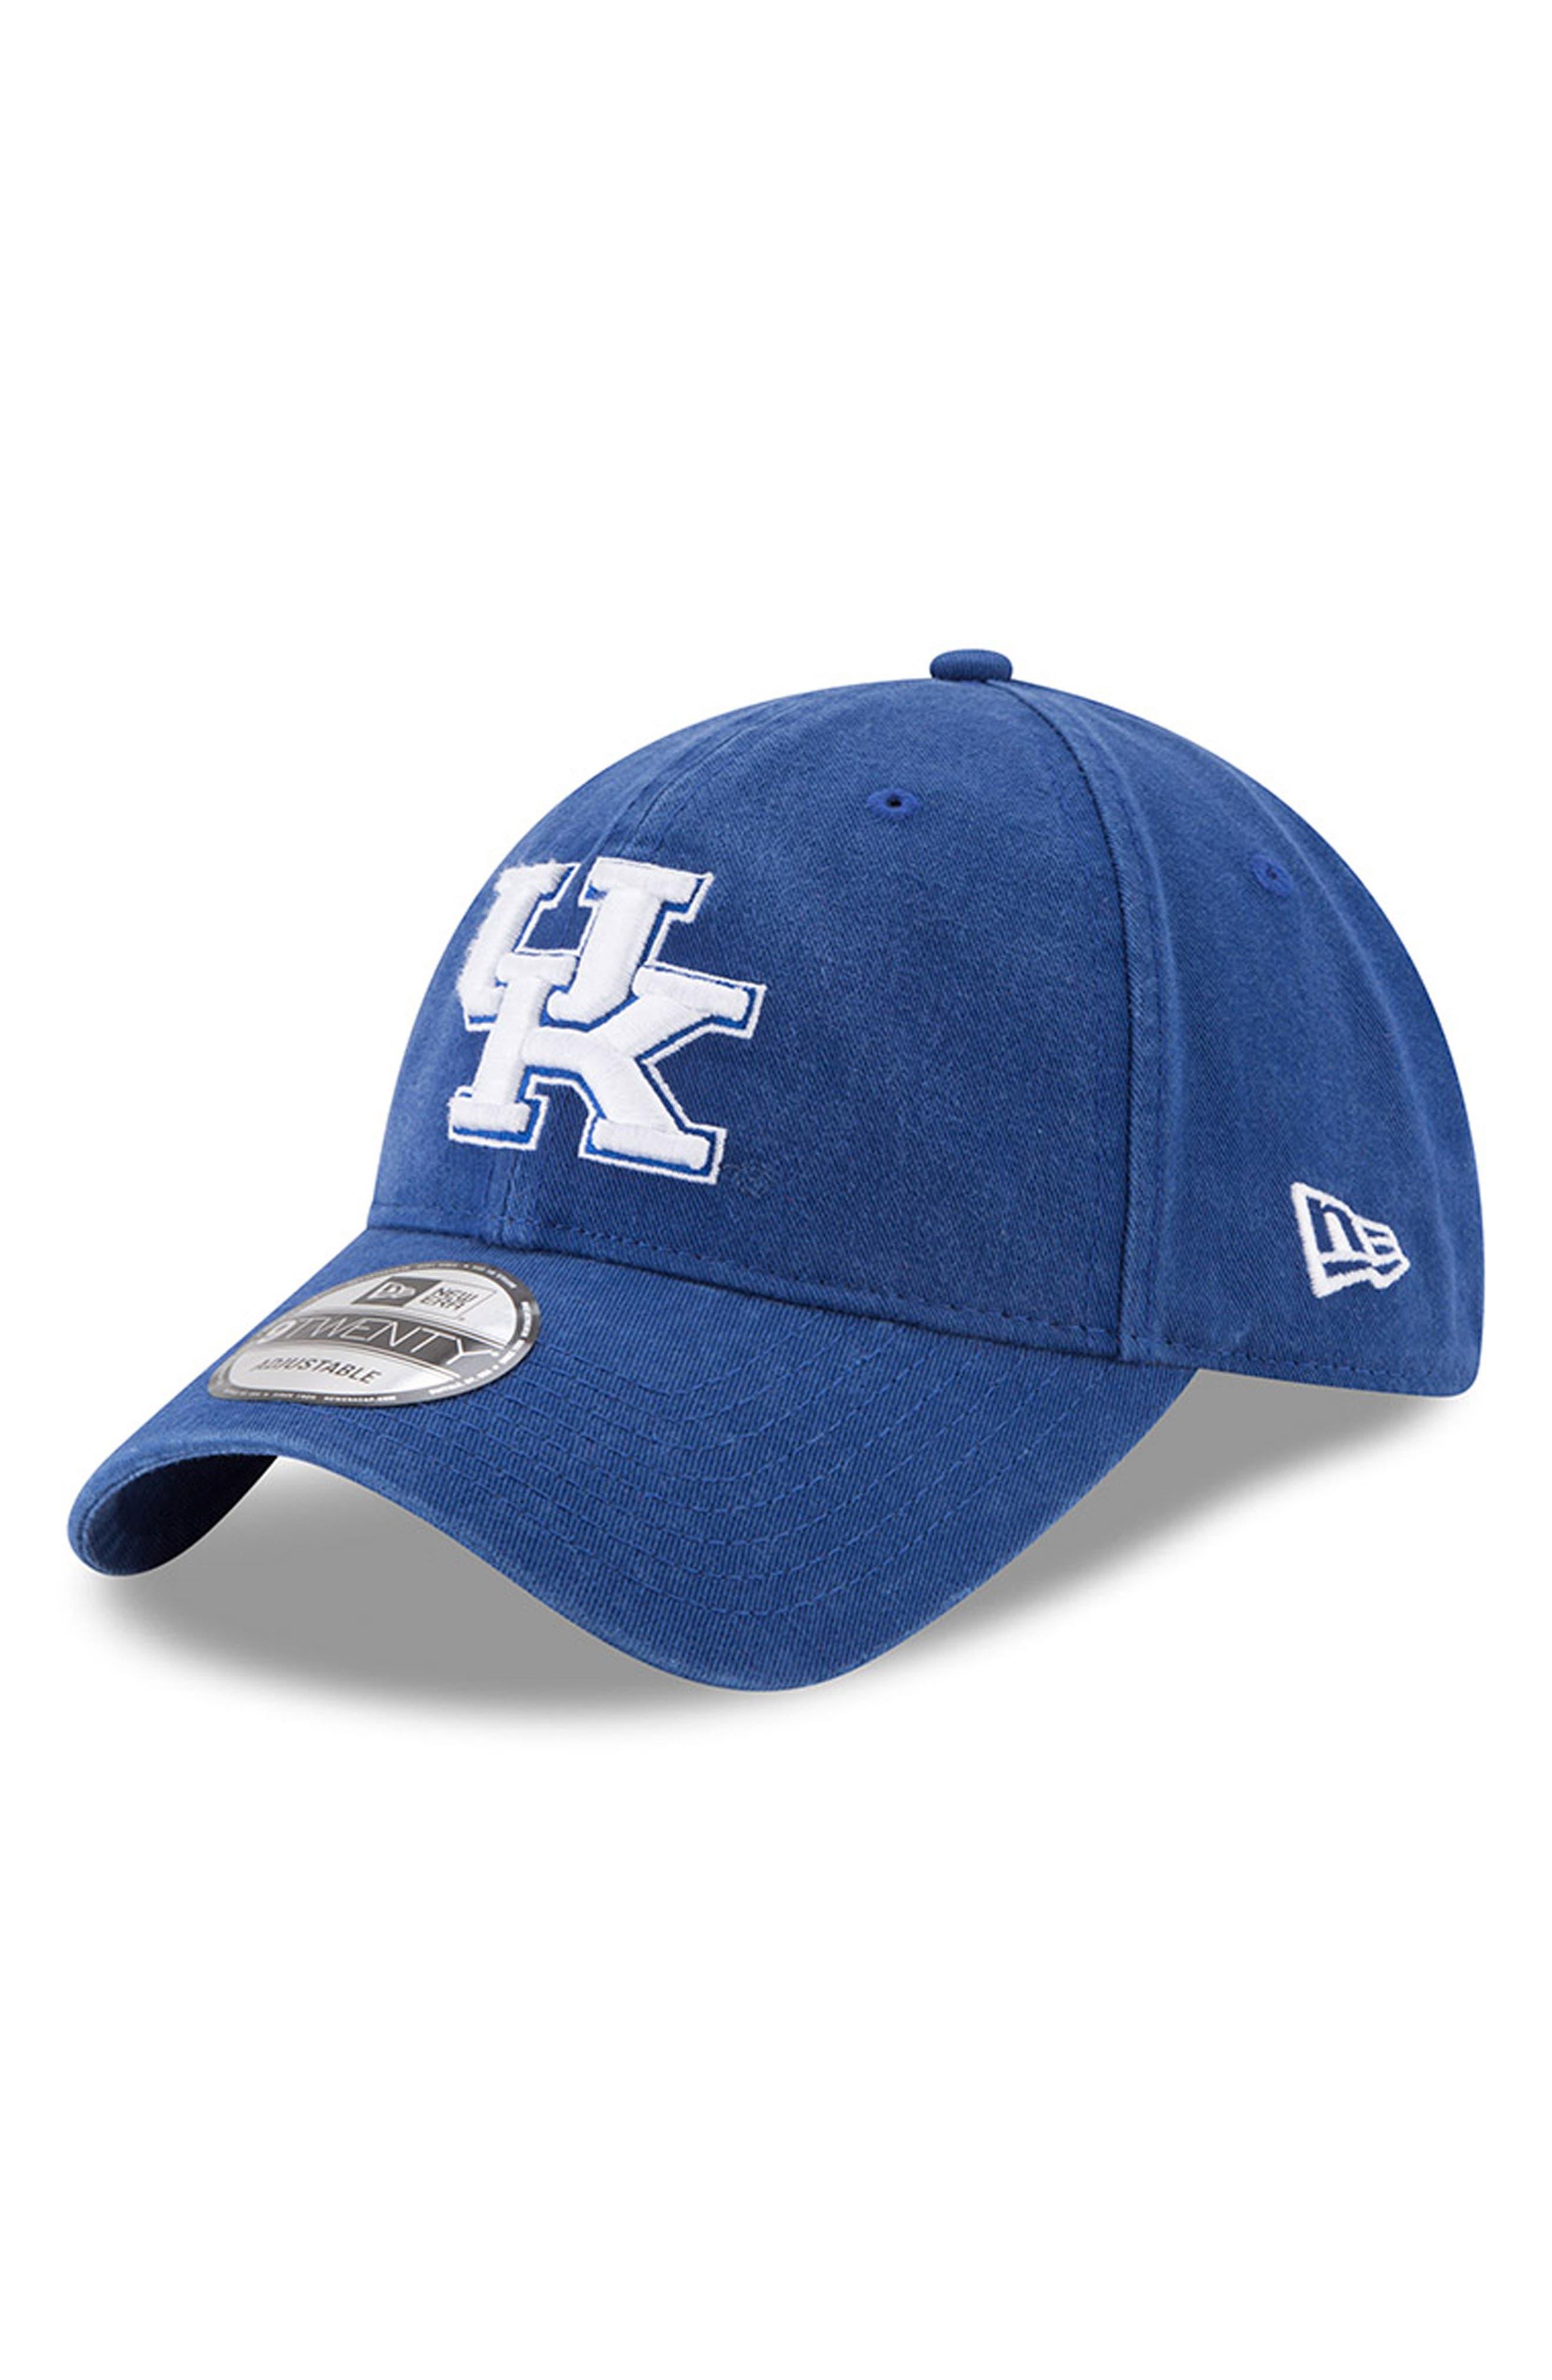 New Era Collegiate Core Classic - Kentucky Wildcats Baseball Cap